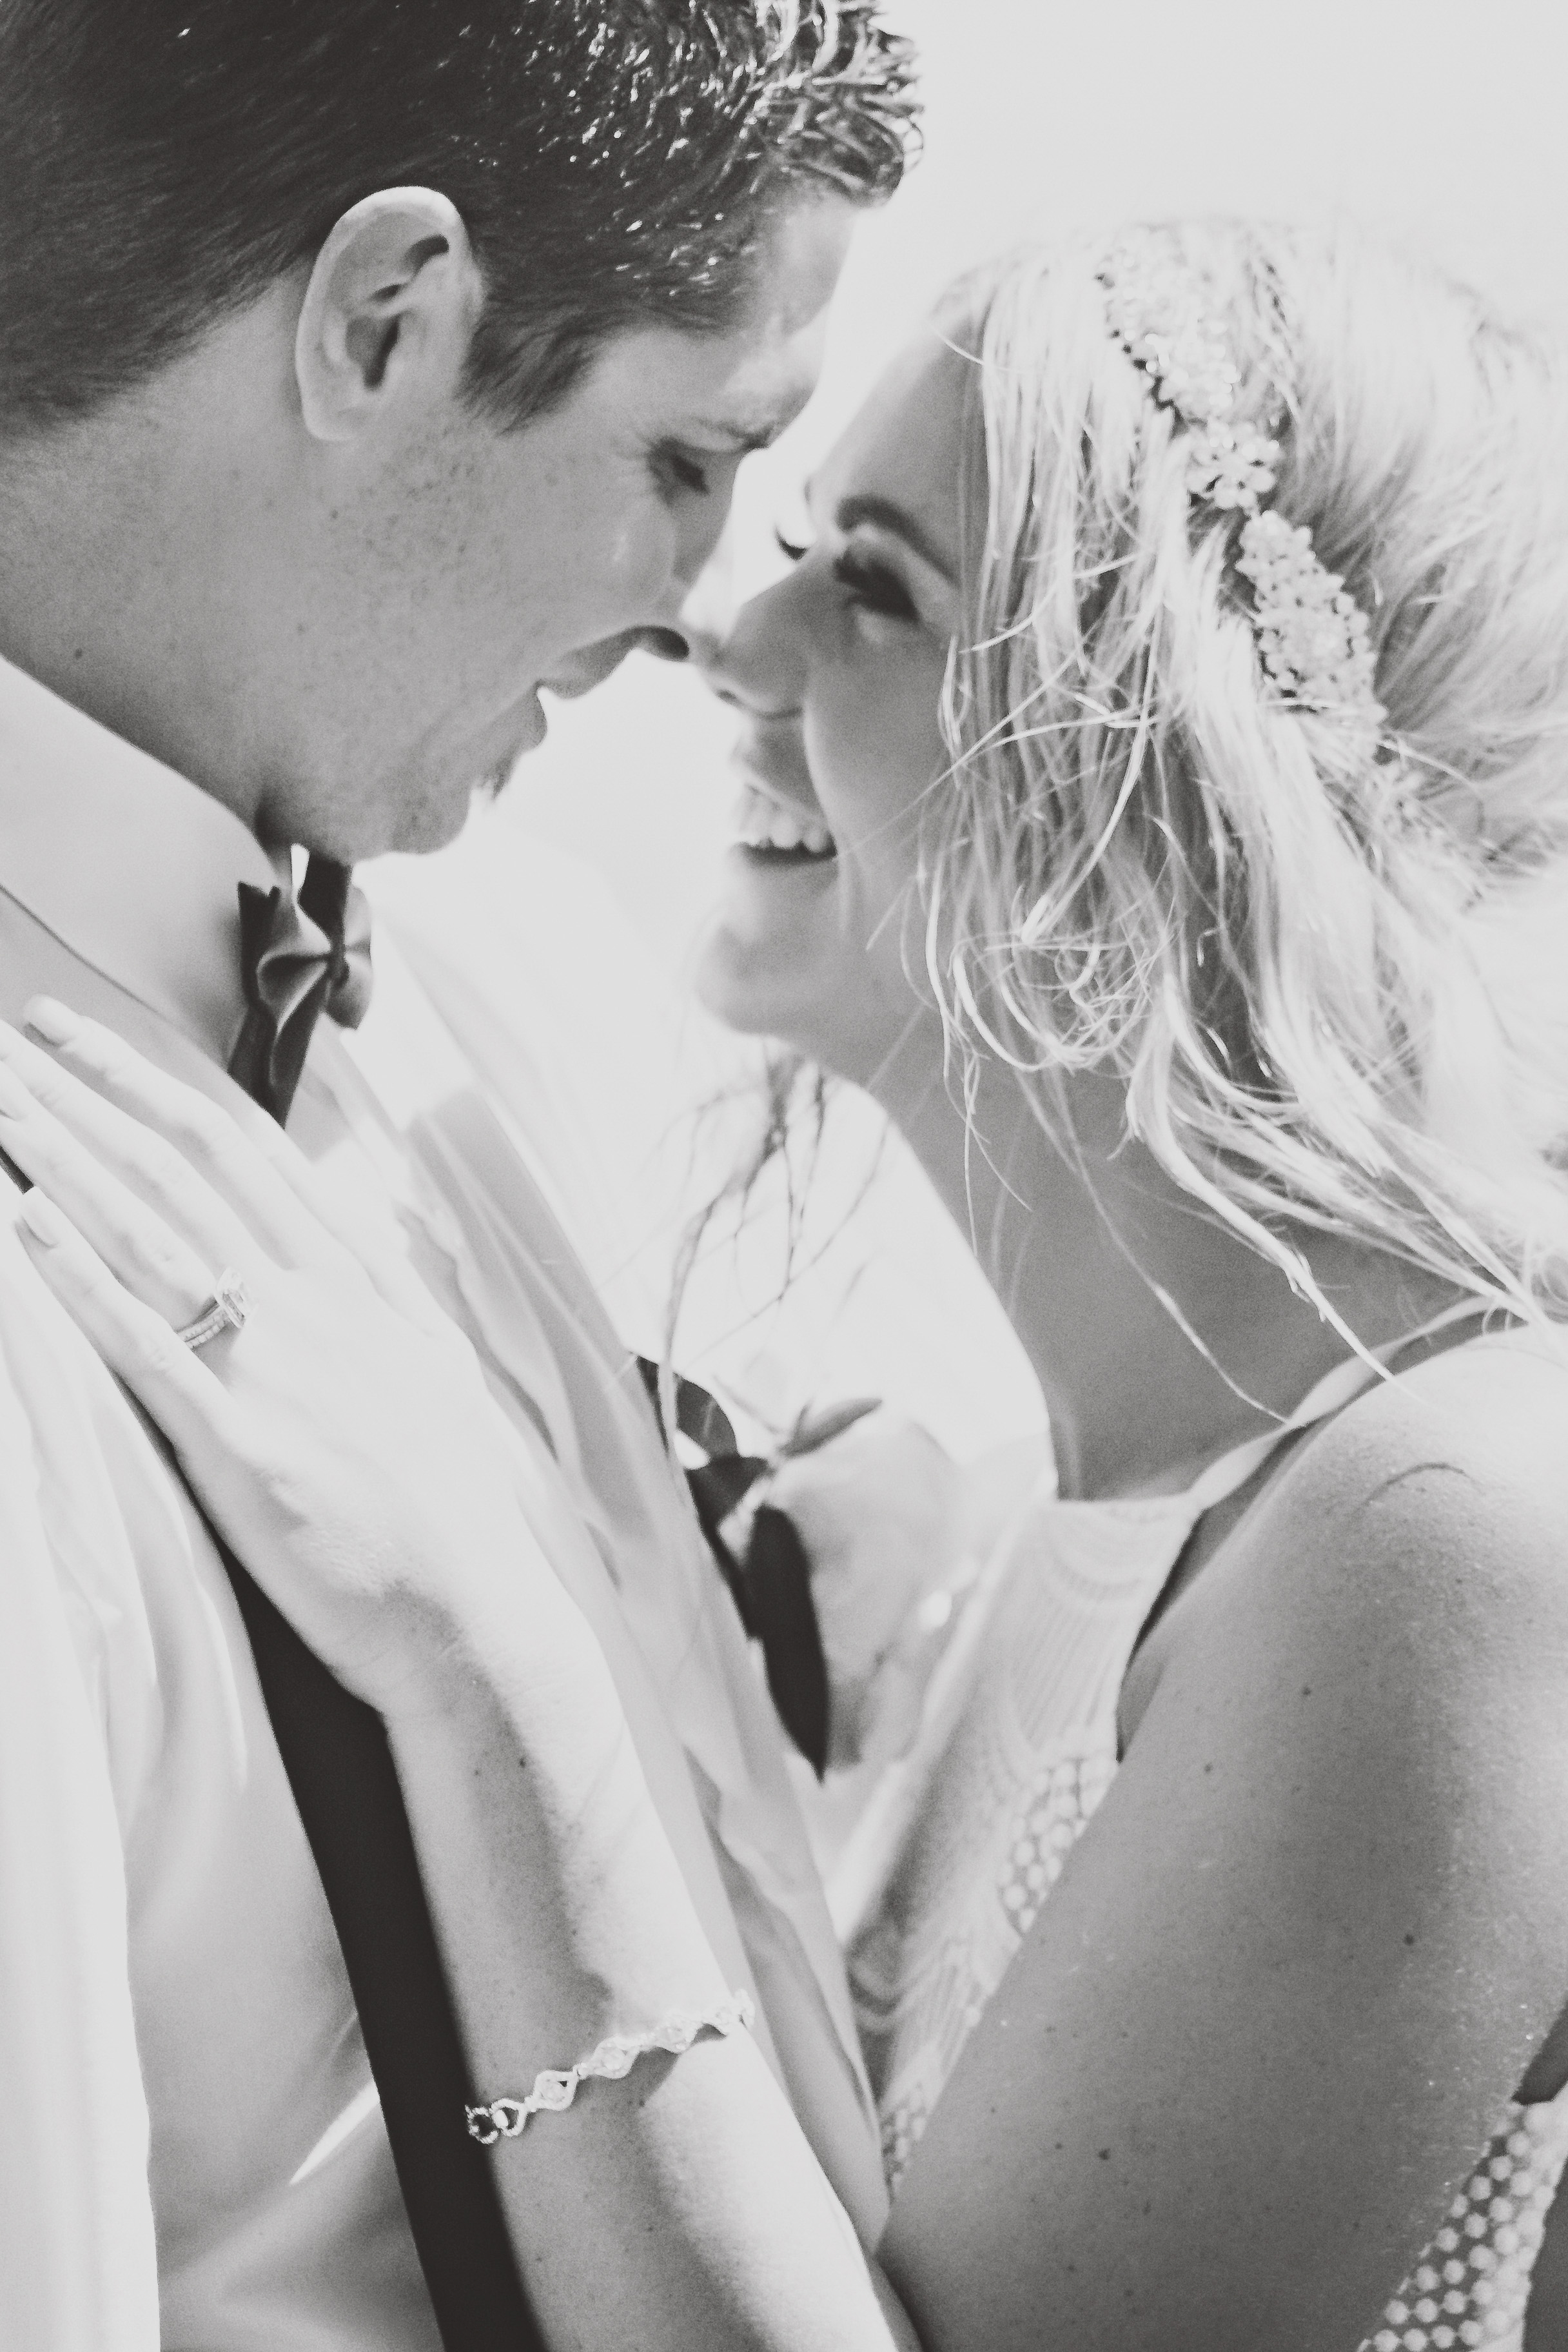 angie-diaz-photography-hawaii-wedding-51.jpg